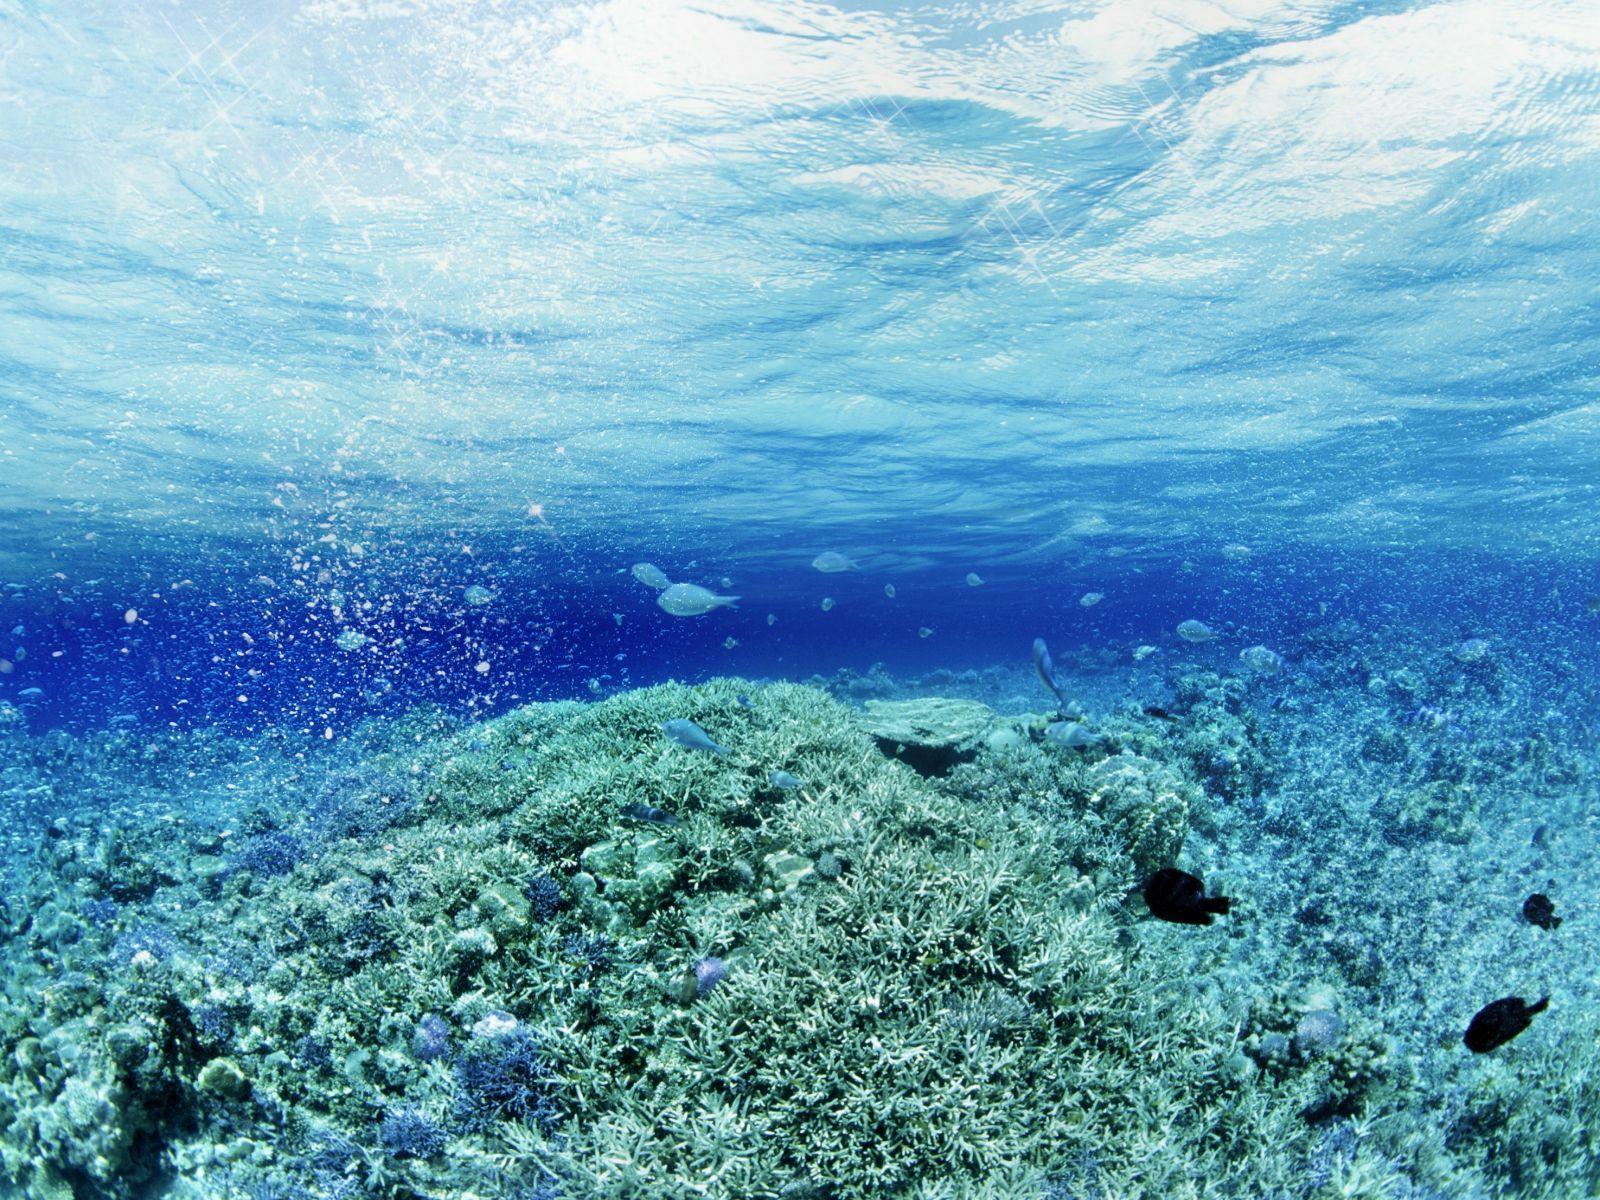 trine underwater scene wallpapers hd wallpapers wallpapers under water wallpapers